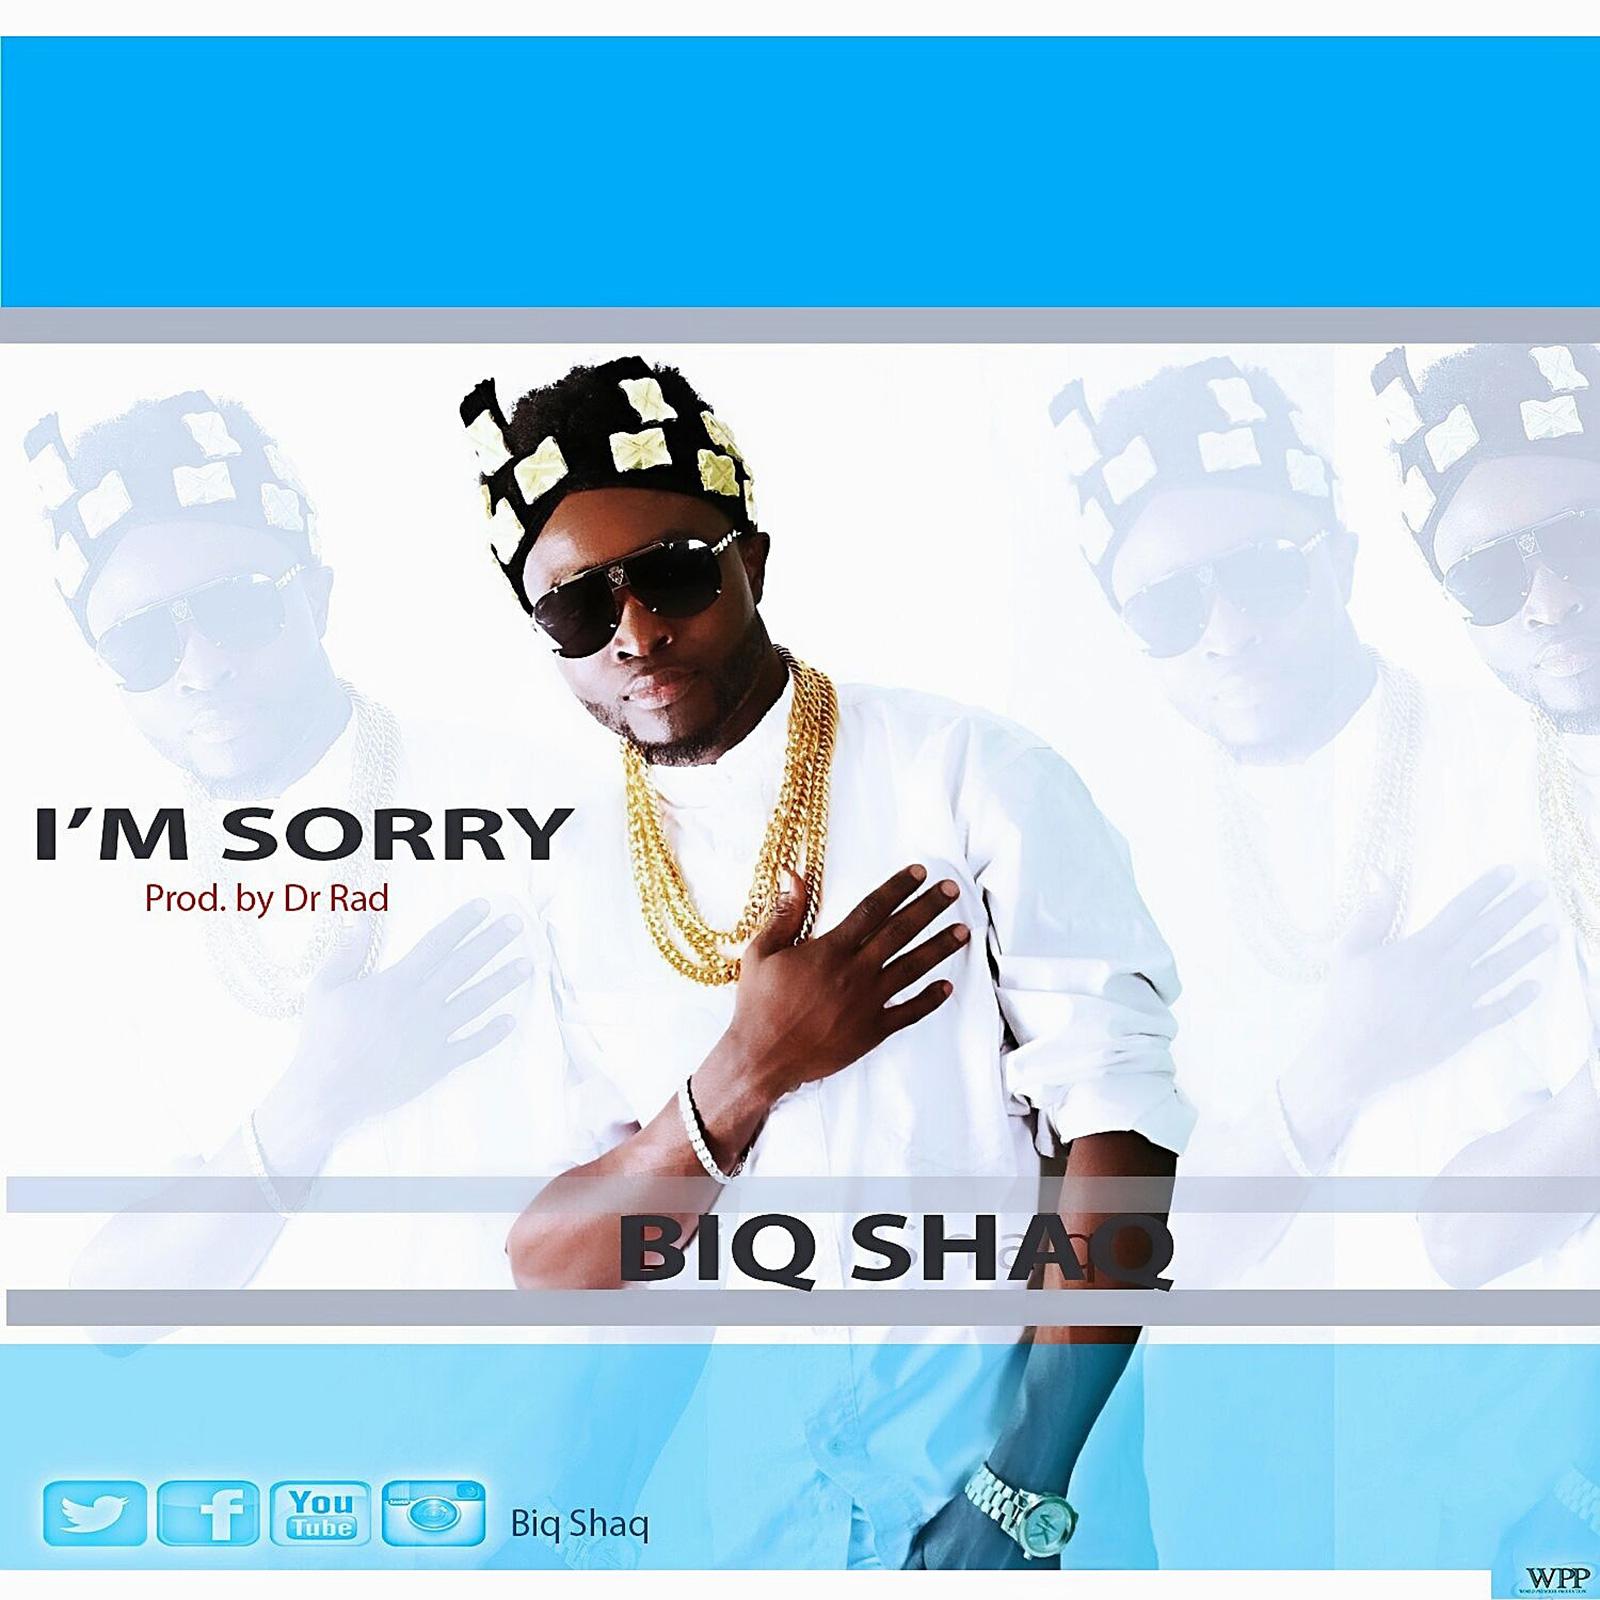 I'm Sorry by Big Shaq